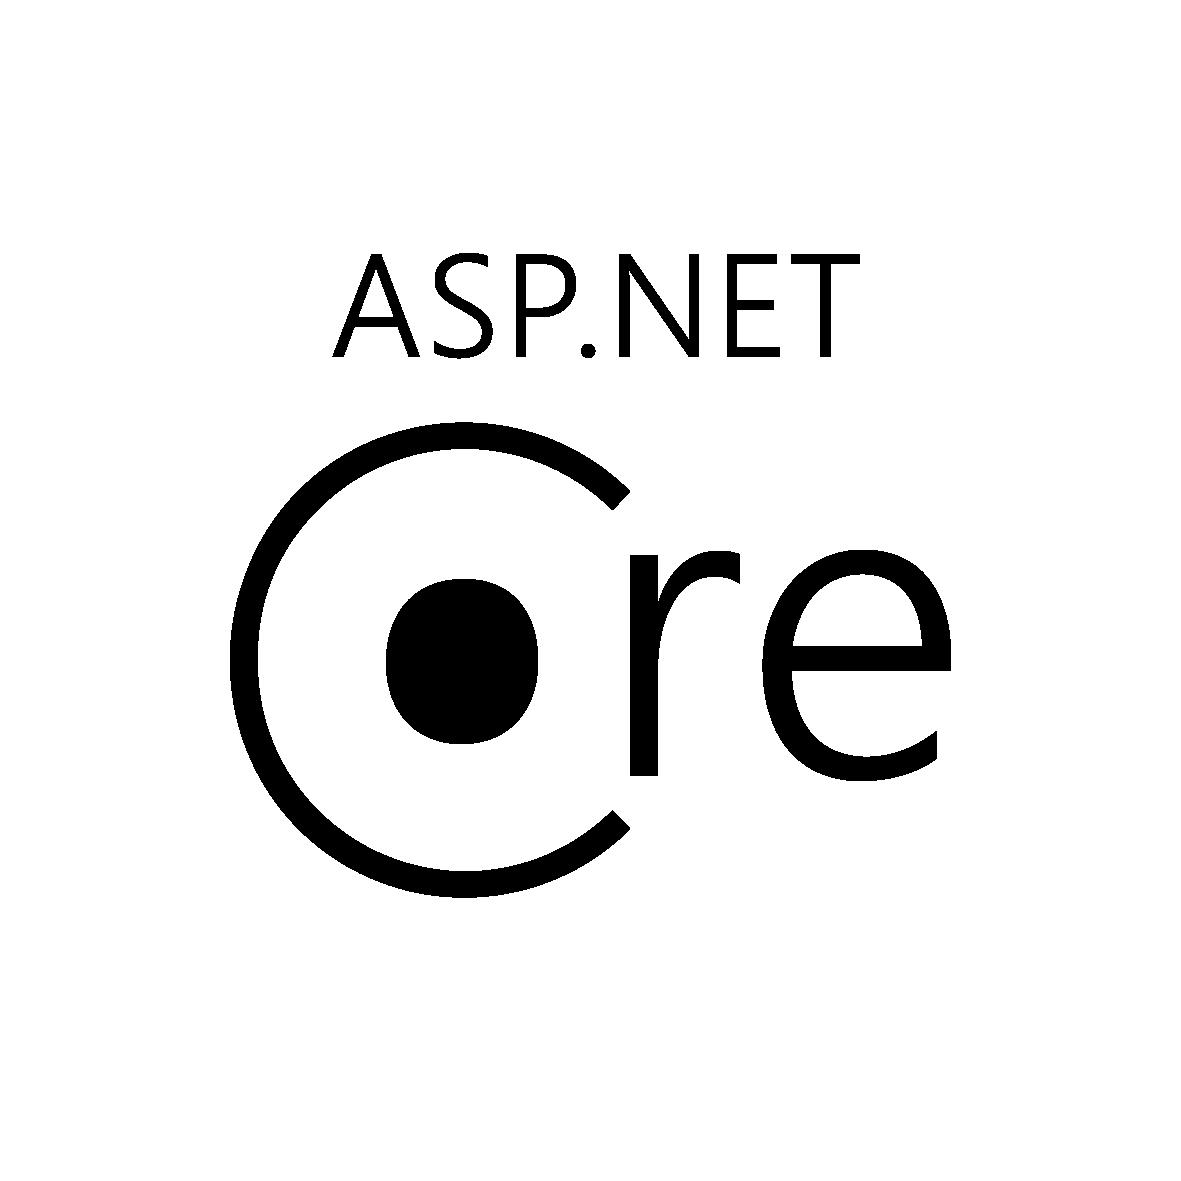 https://raw.githubusercontent.com/campusMVP/dotnetCoreLogoPack/master/ASP.NET%20Core/Bitmap%20RGB/Bitmap-BIG_ASP.NET-Core-Logo_Black_Square_RGB.png